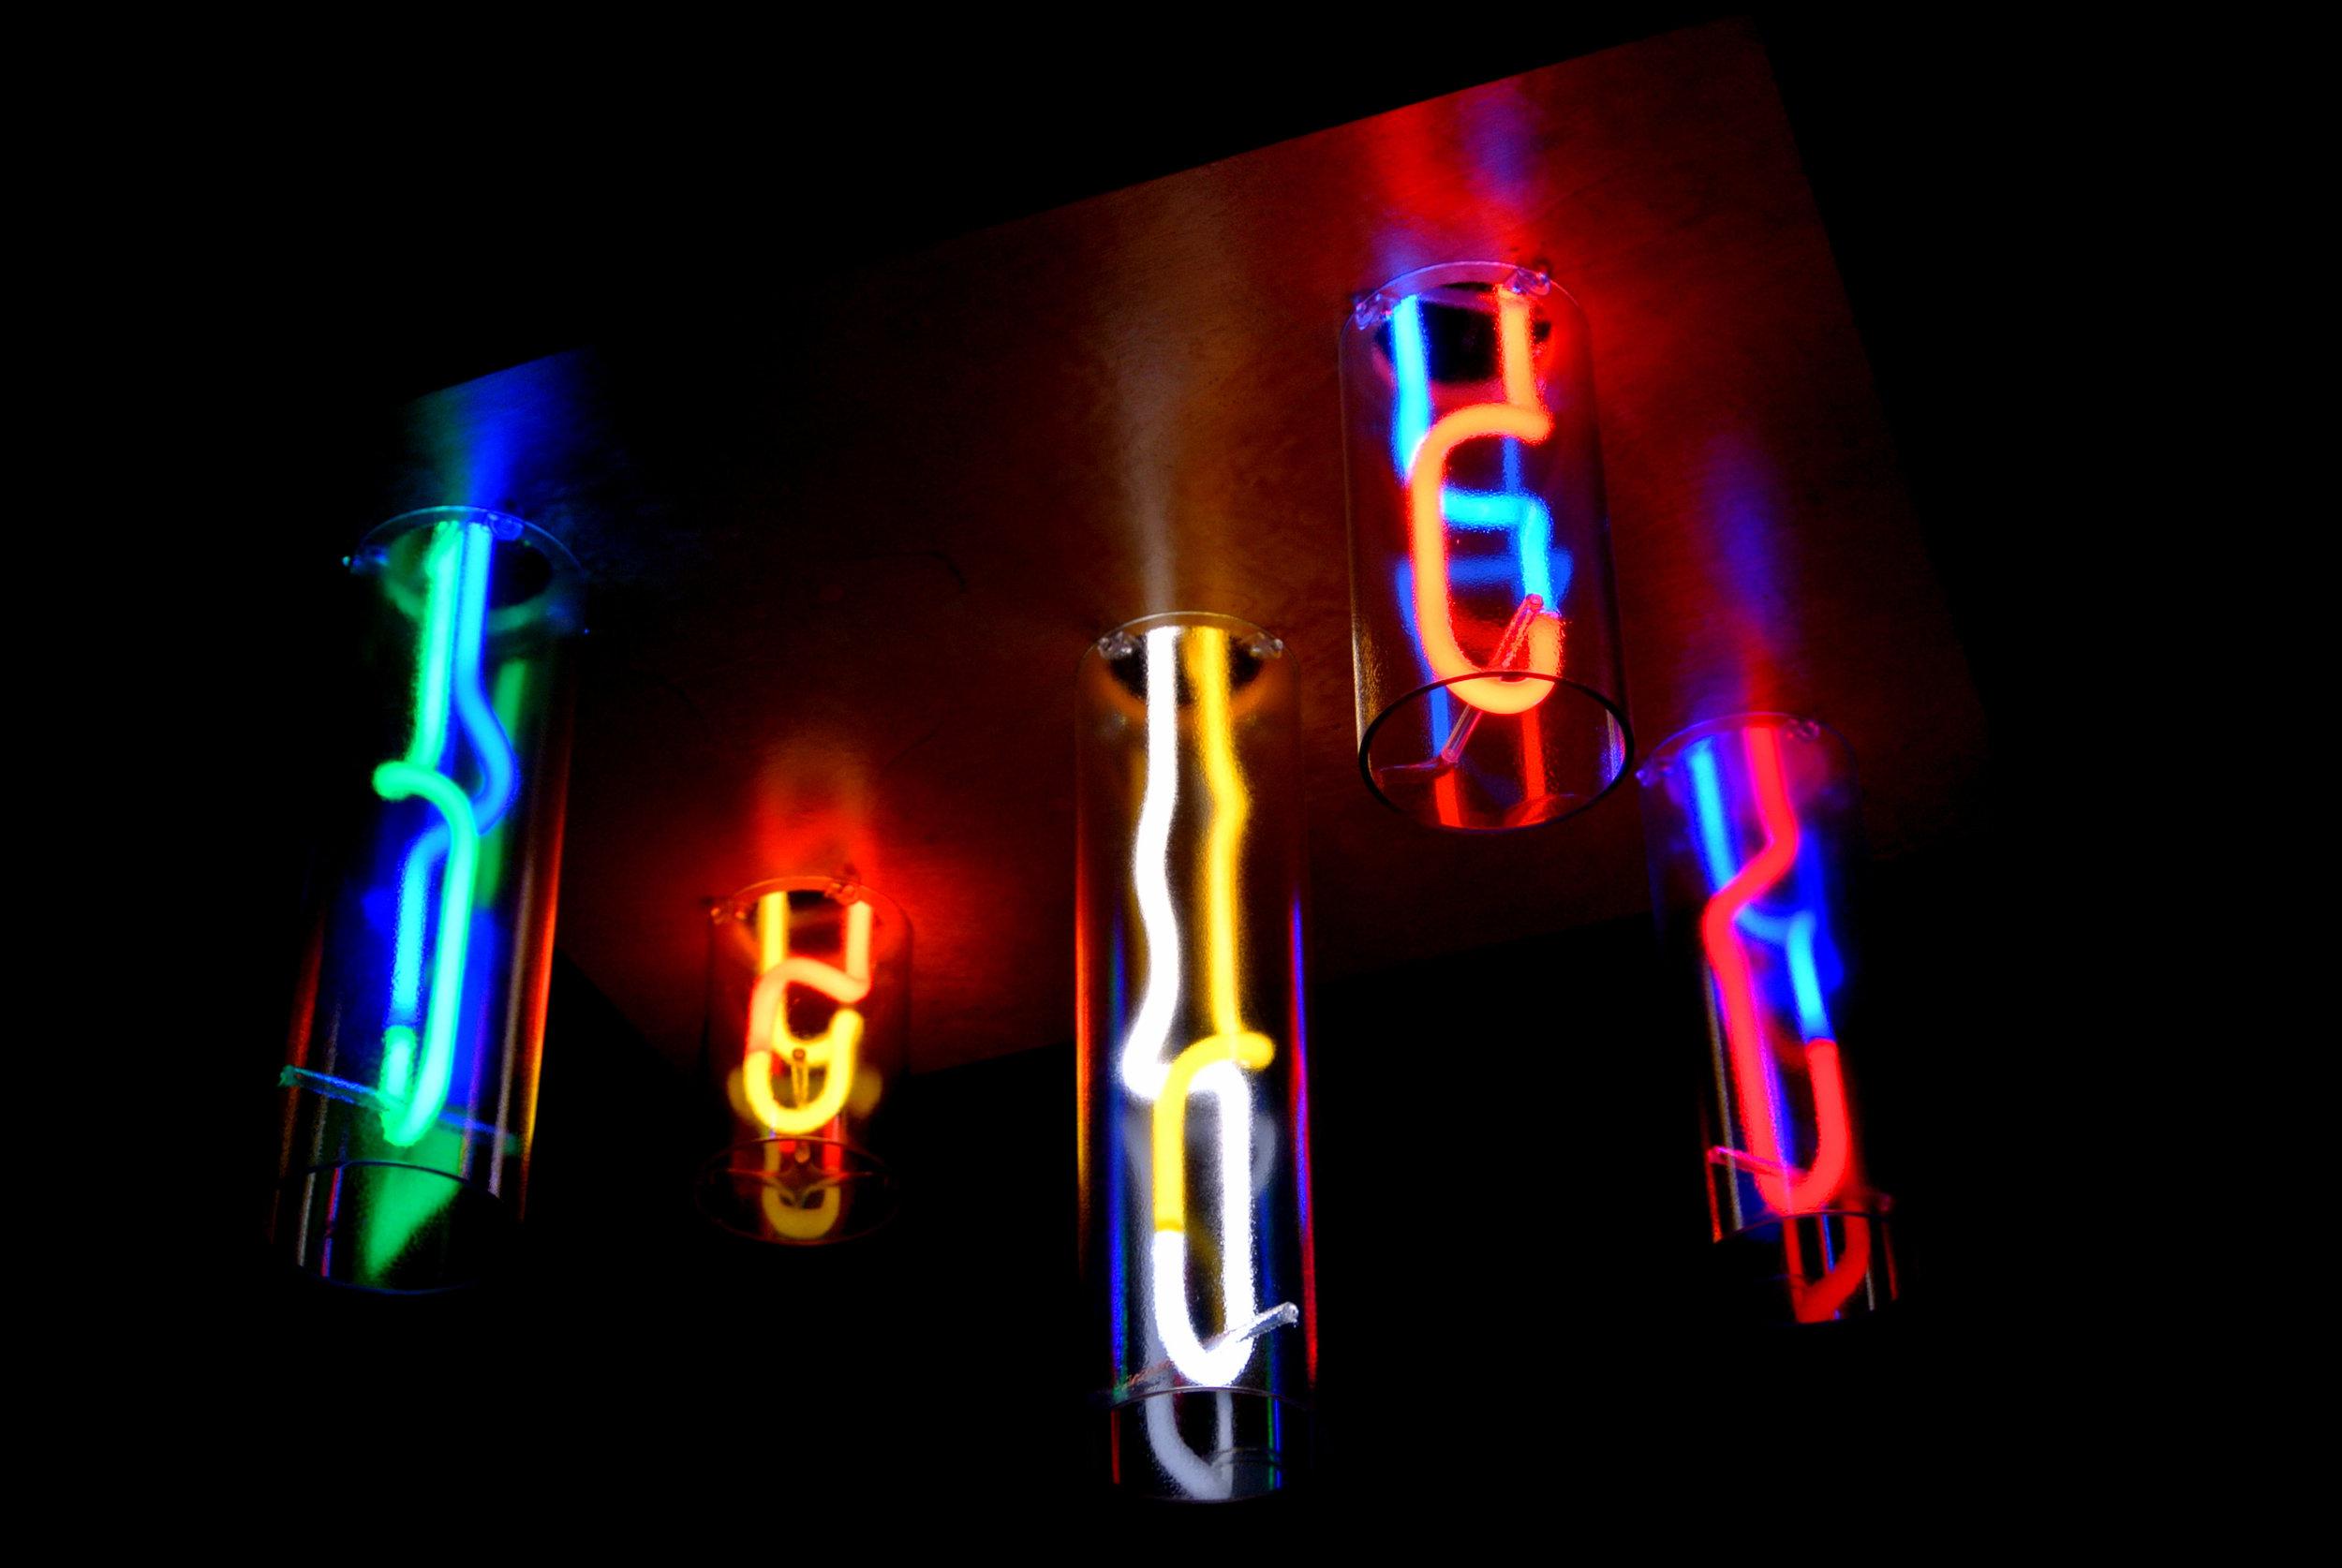 Elegant Custom Neon Chandeliers by John Barton - BartonNeonMagic.com